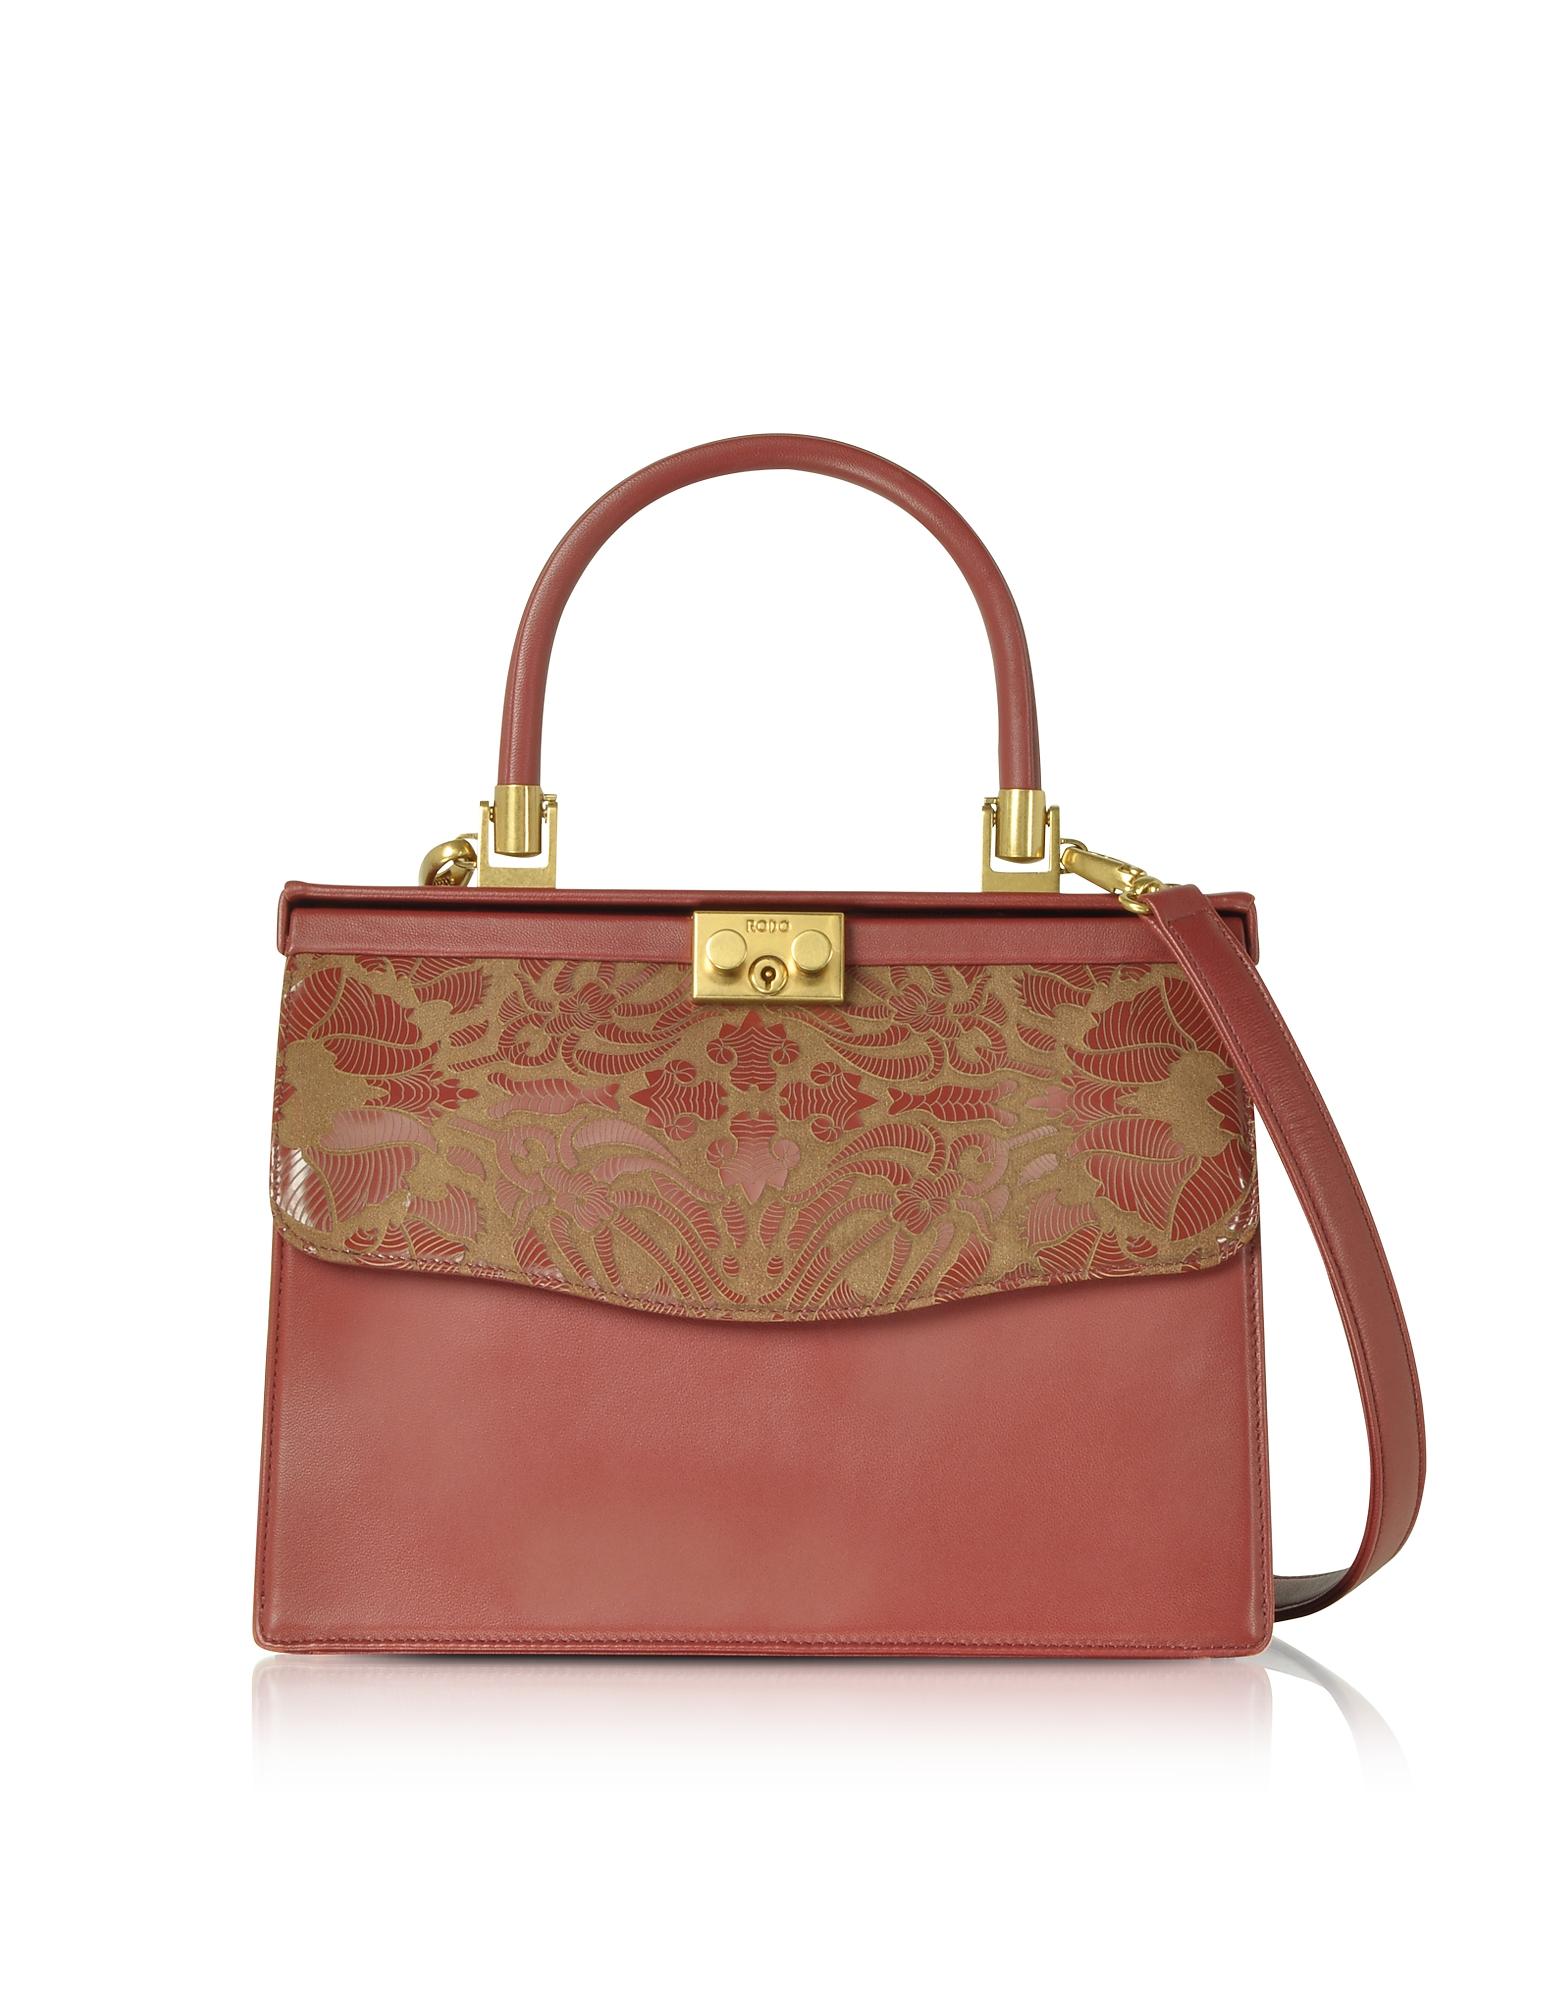 Rodo Handbags, Laser Printed Leather Top Handle Satchel Bag